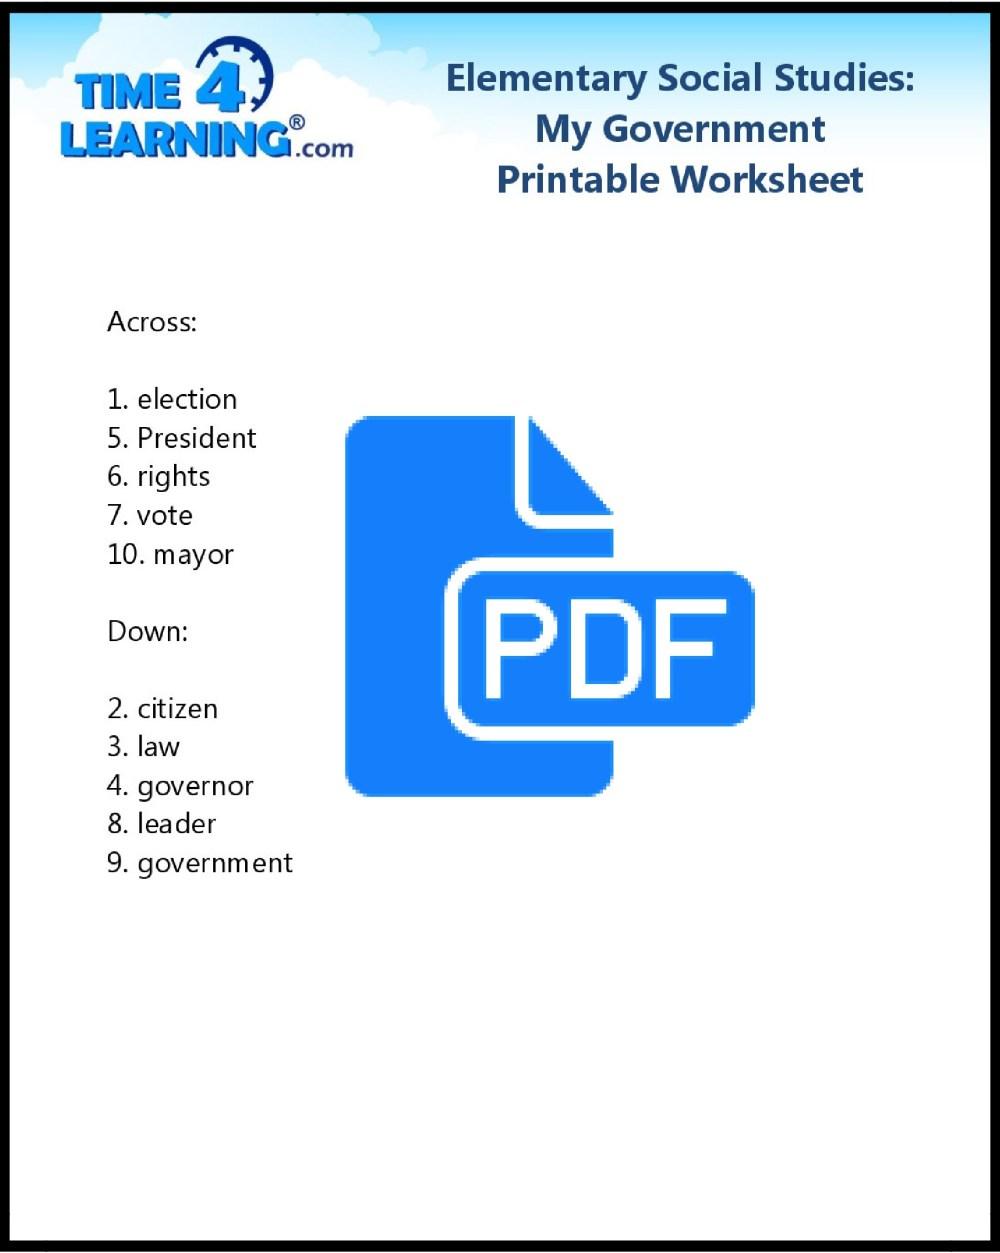 medium resolution of Free Printable: Elementary Social Studies Worksheet   Time4Learning